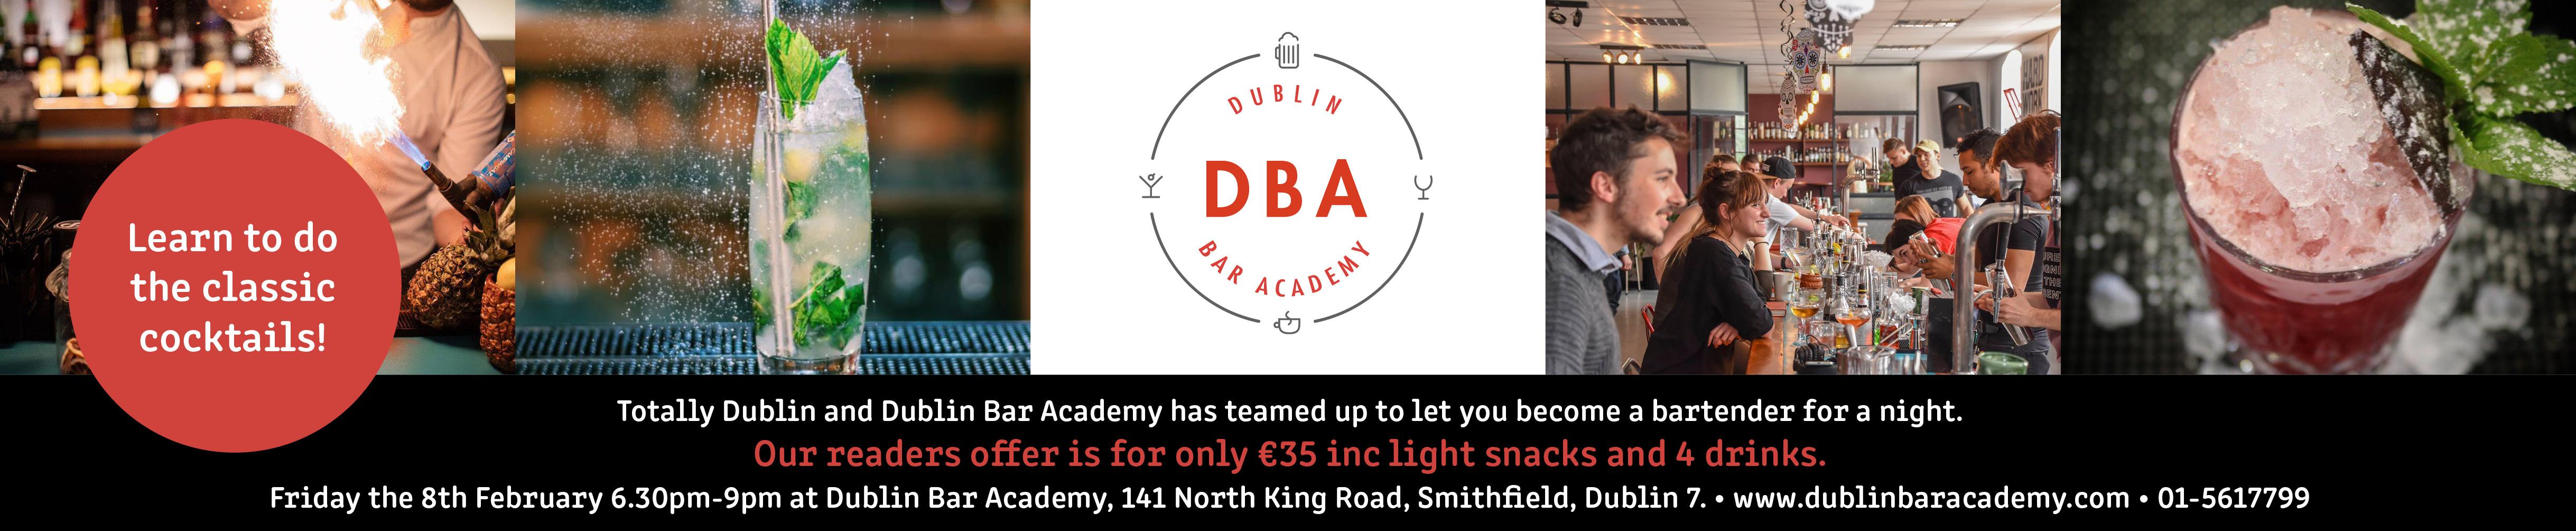 DBA+TD Become a bartender banner